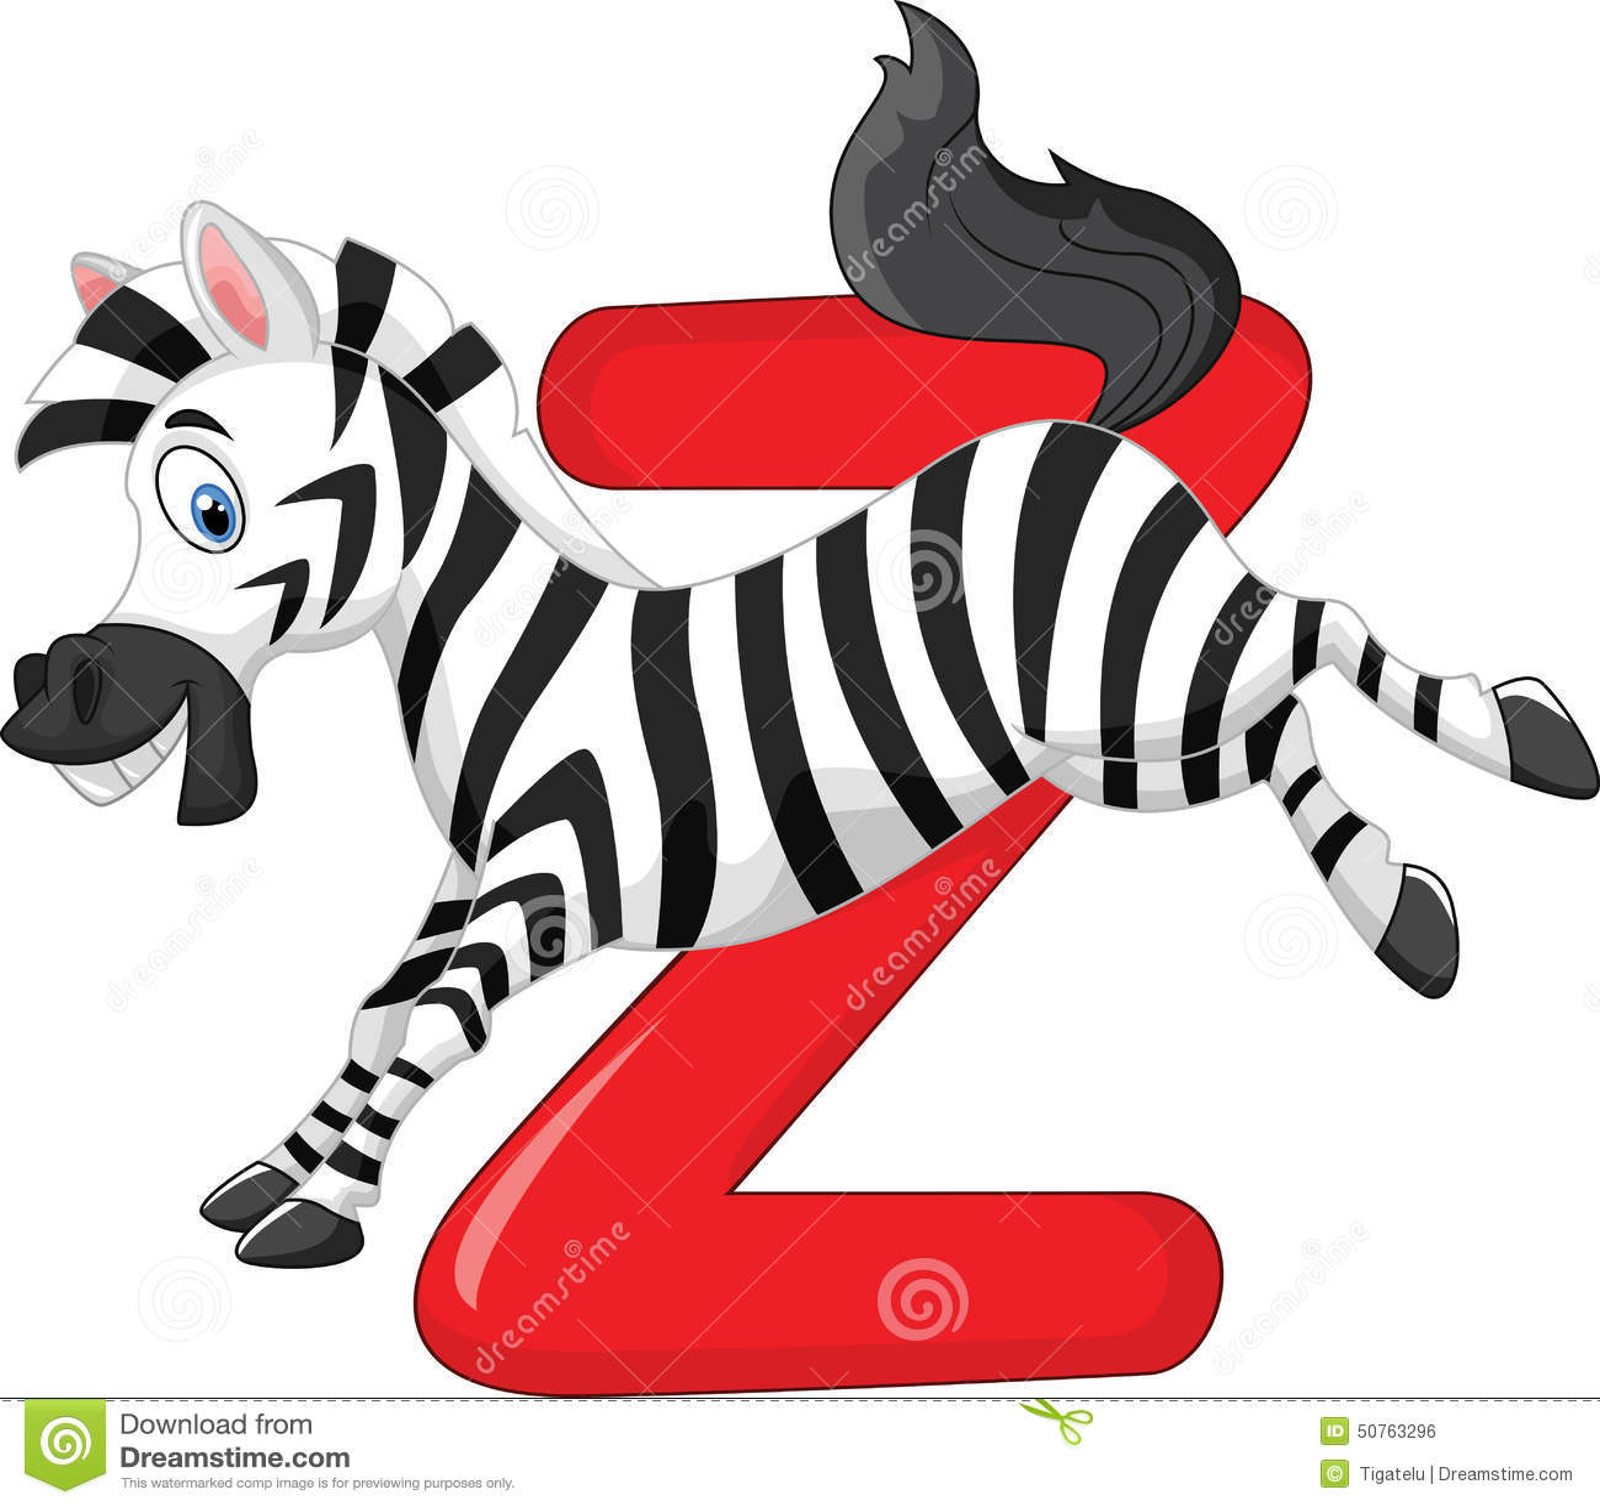 Cartoon Characters Letter Z : Cartoon zebra with alphabet z stock vector image